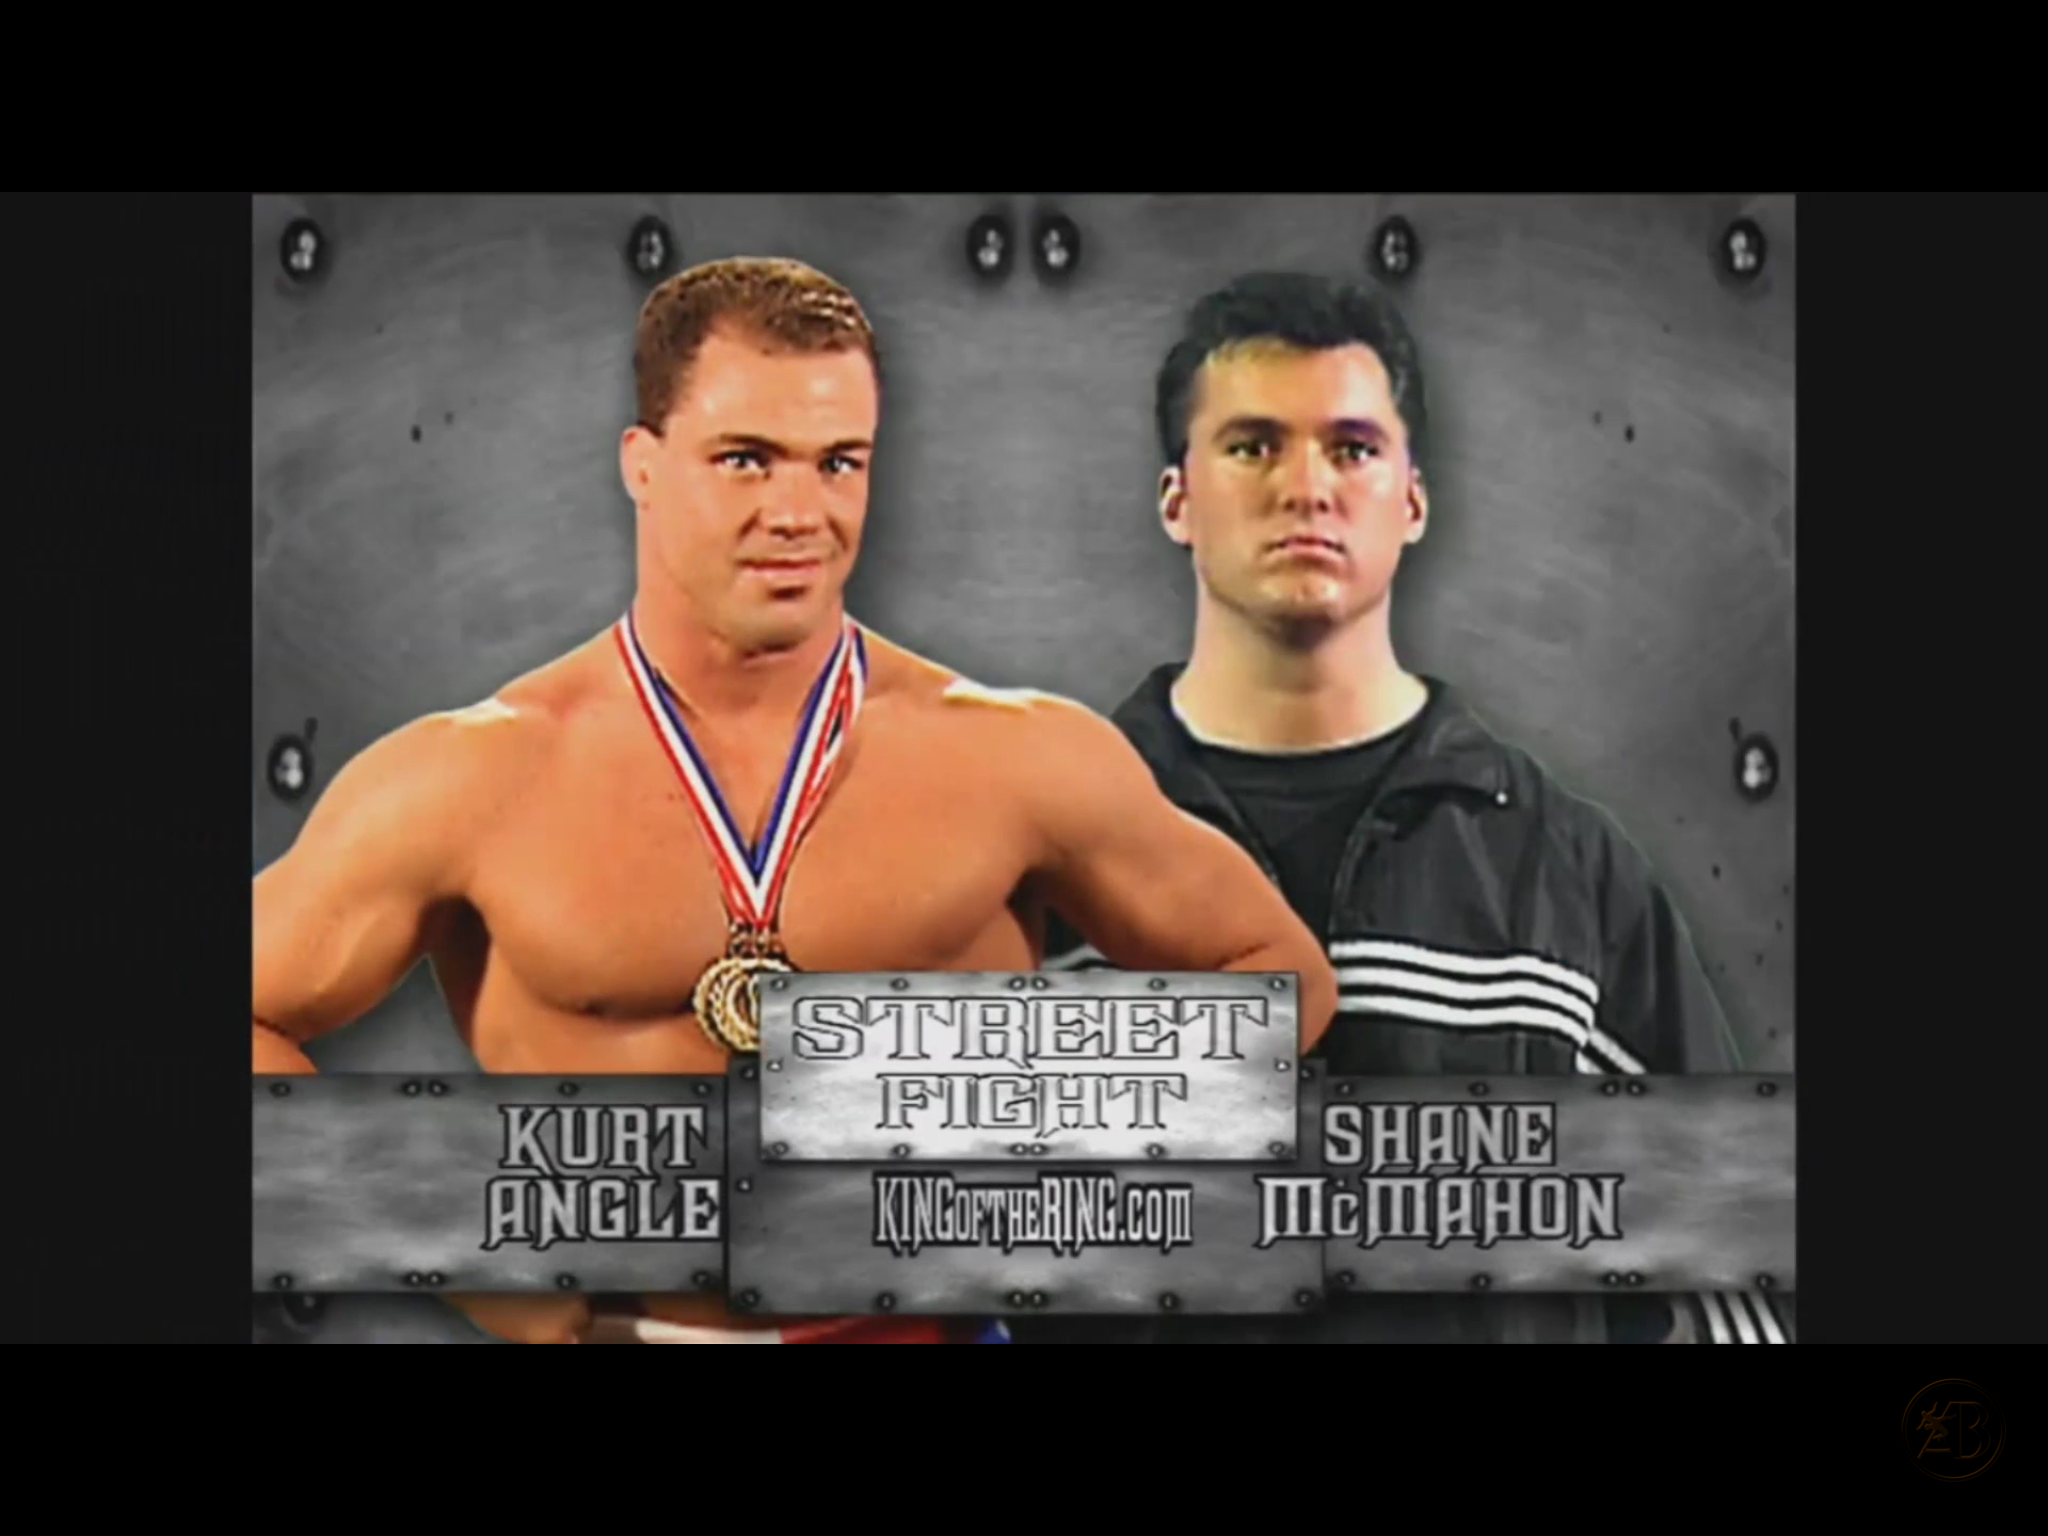 Wwf King Of The Ring 2001 Street Fight Kurt Angle Vs Shane